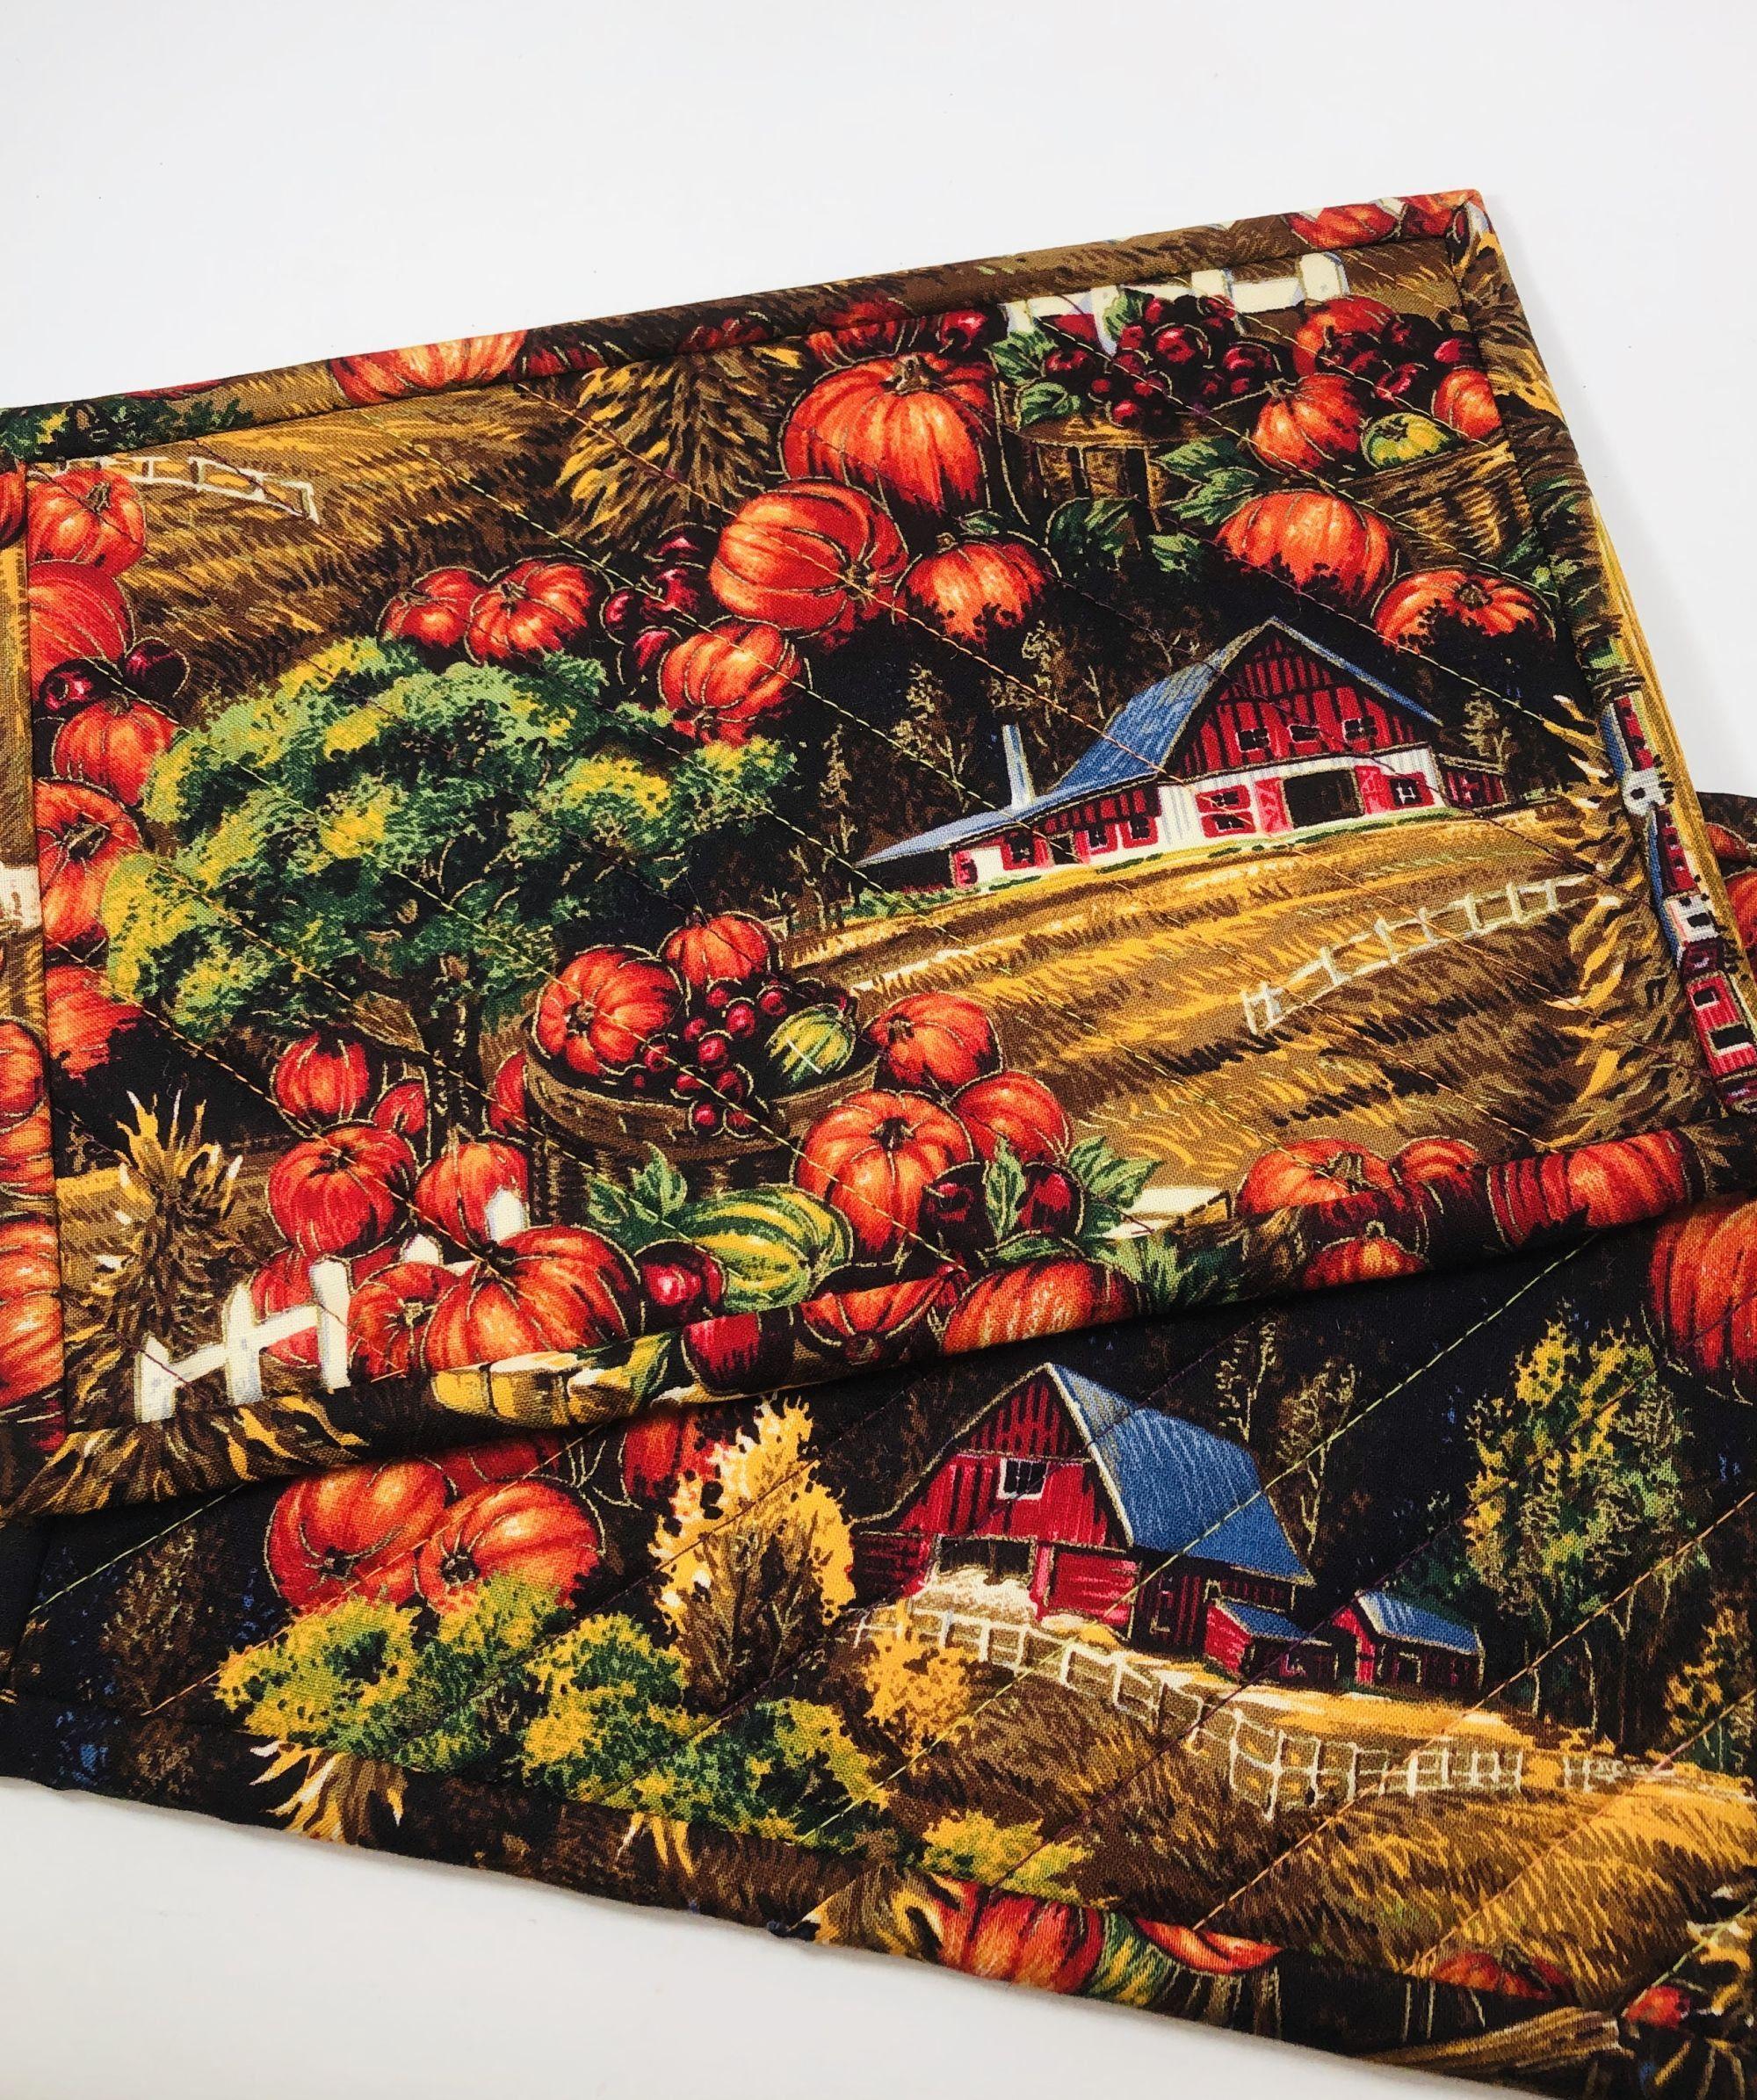 Momma Bear Design Mug Rug Placemat Table Mat Large Coaster Mona/'s Sewing Treasures 9.5x6.5